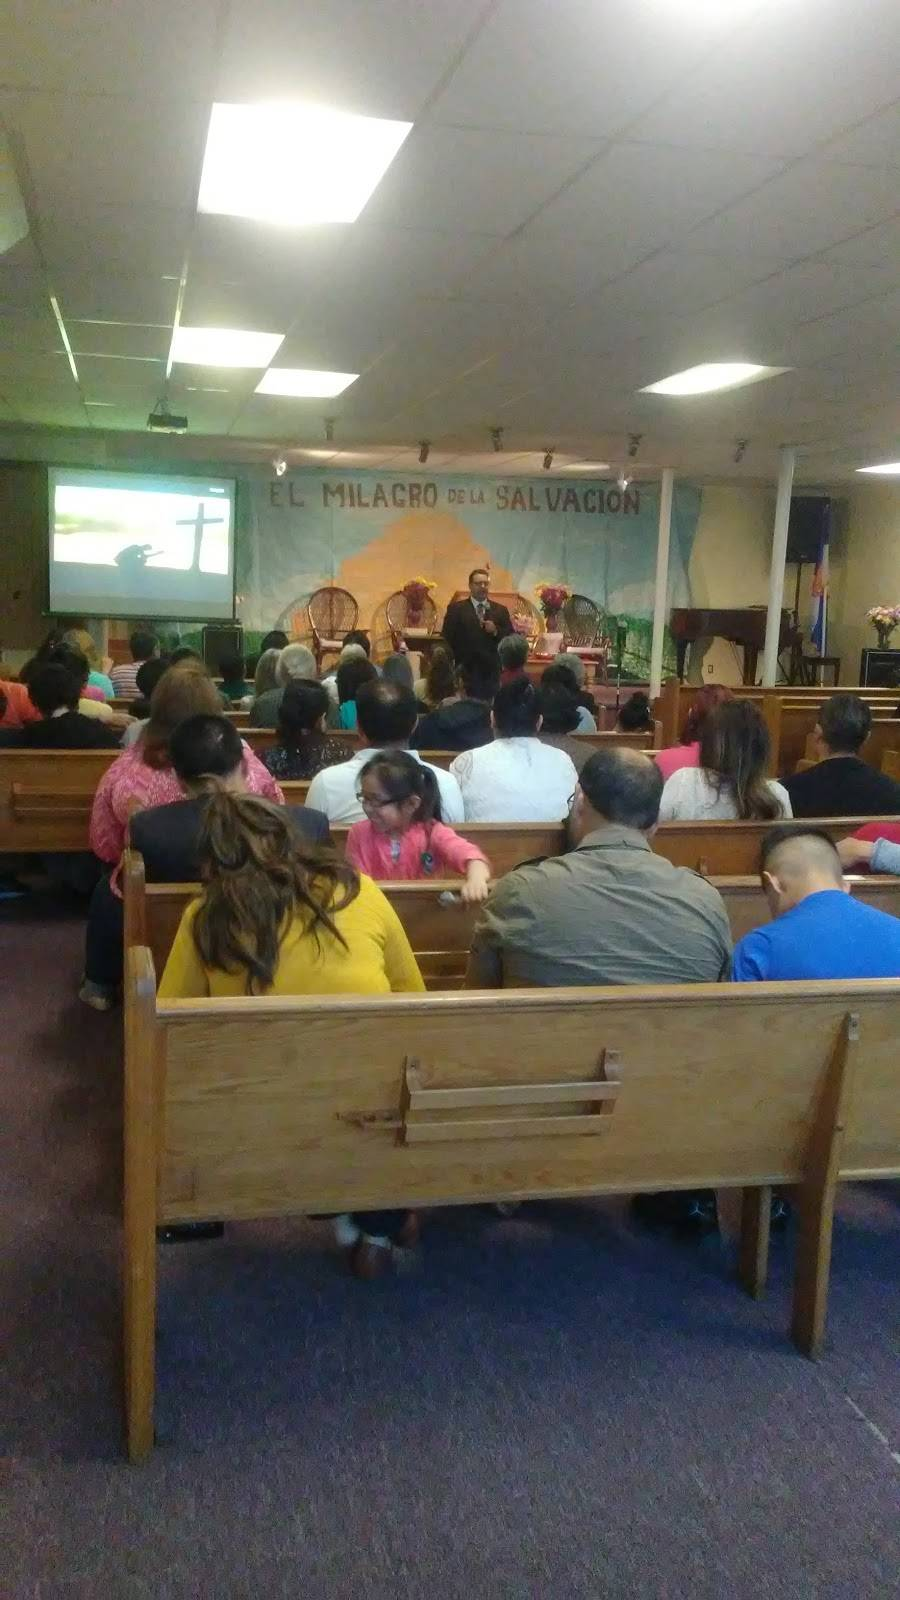 Detroit Cavalry Spanish SDA Church - church  | Photo 8 of 10 | Address: 1227 Cavalry St, Detroit, MI 48209, USA | Phone: (313) 842-2730